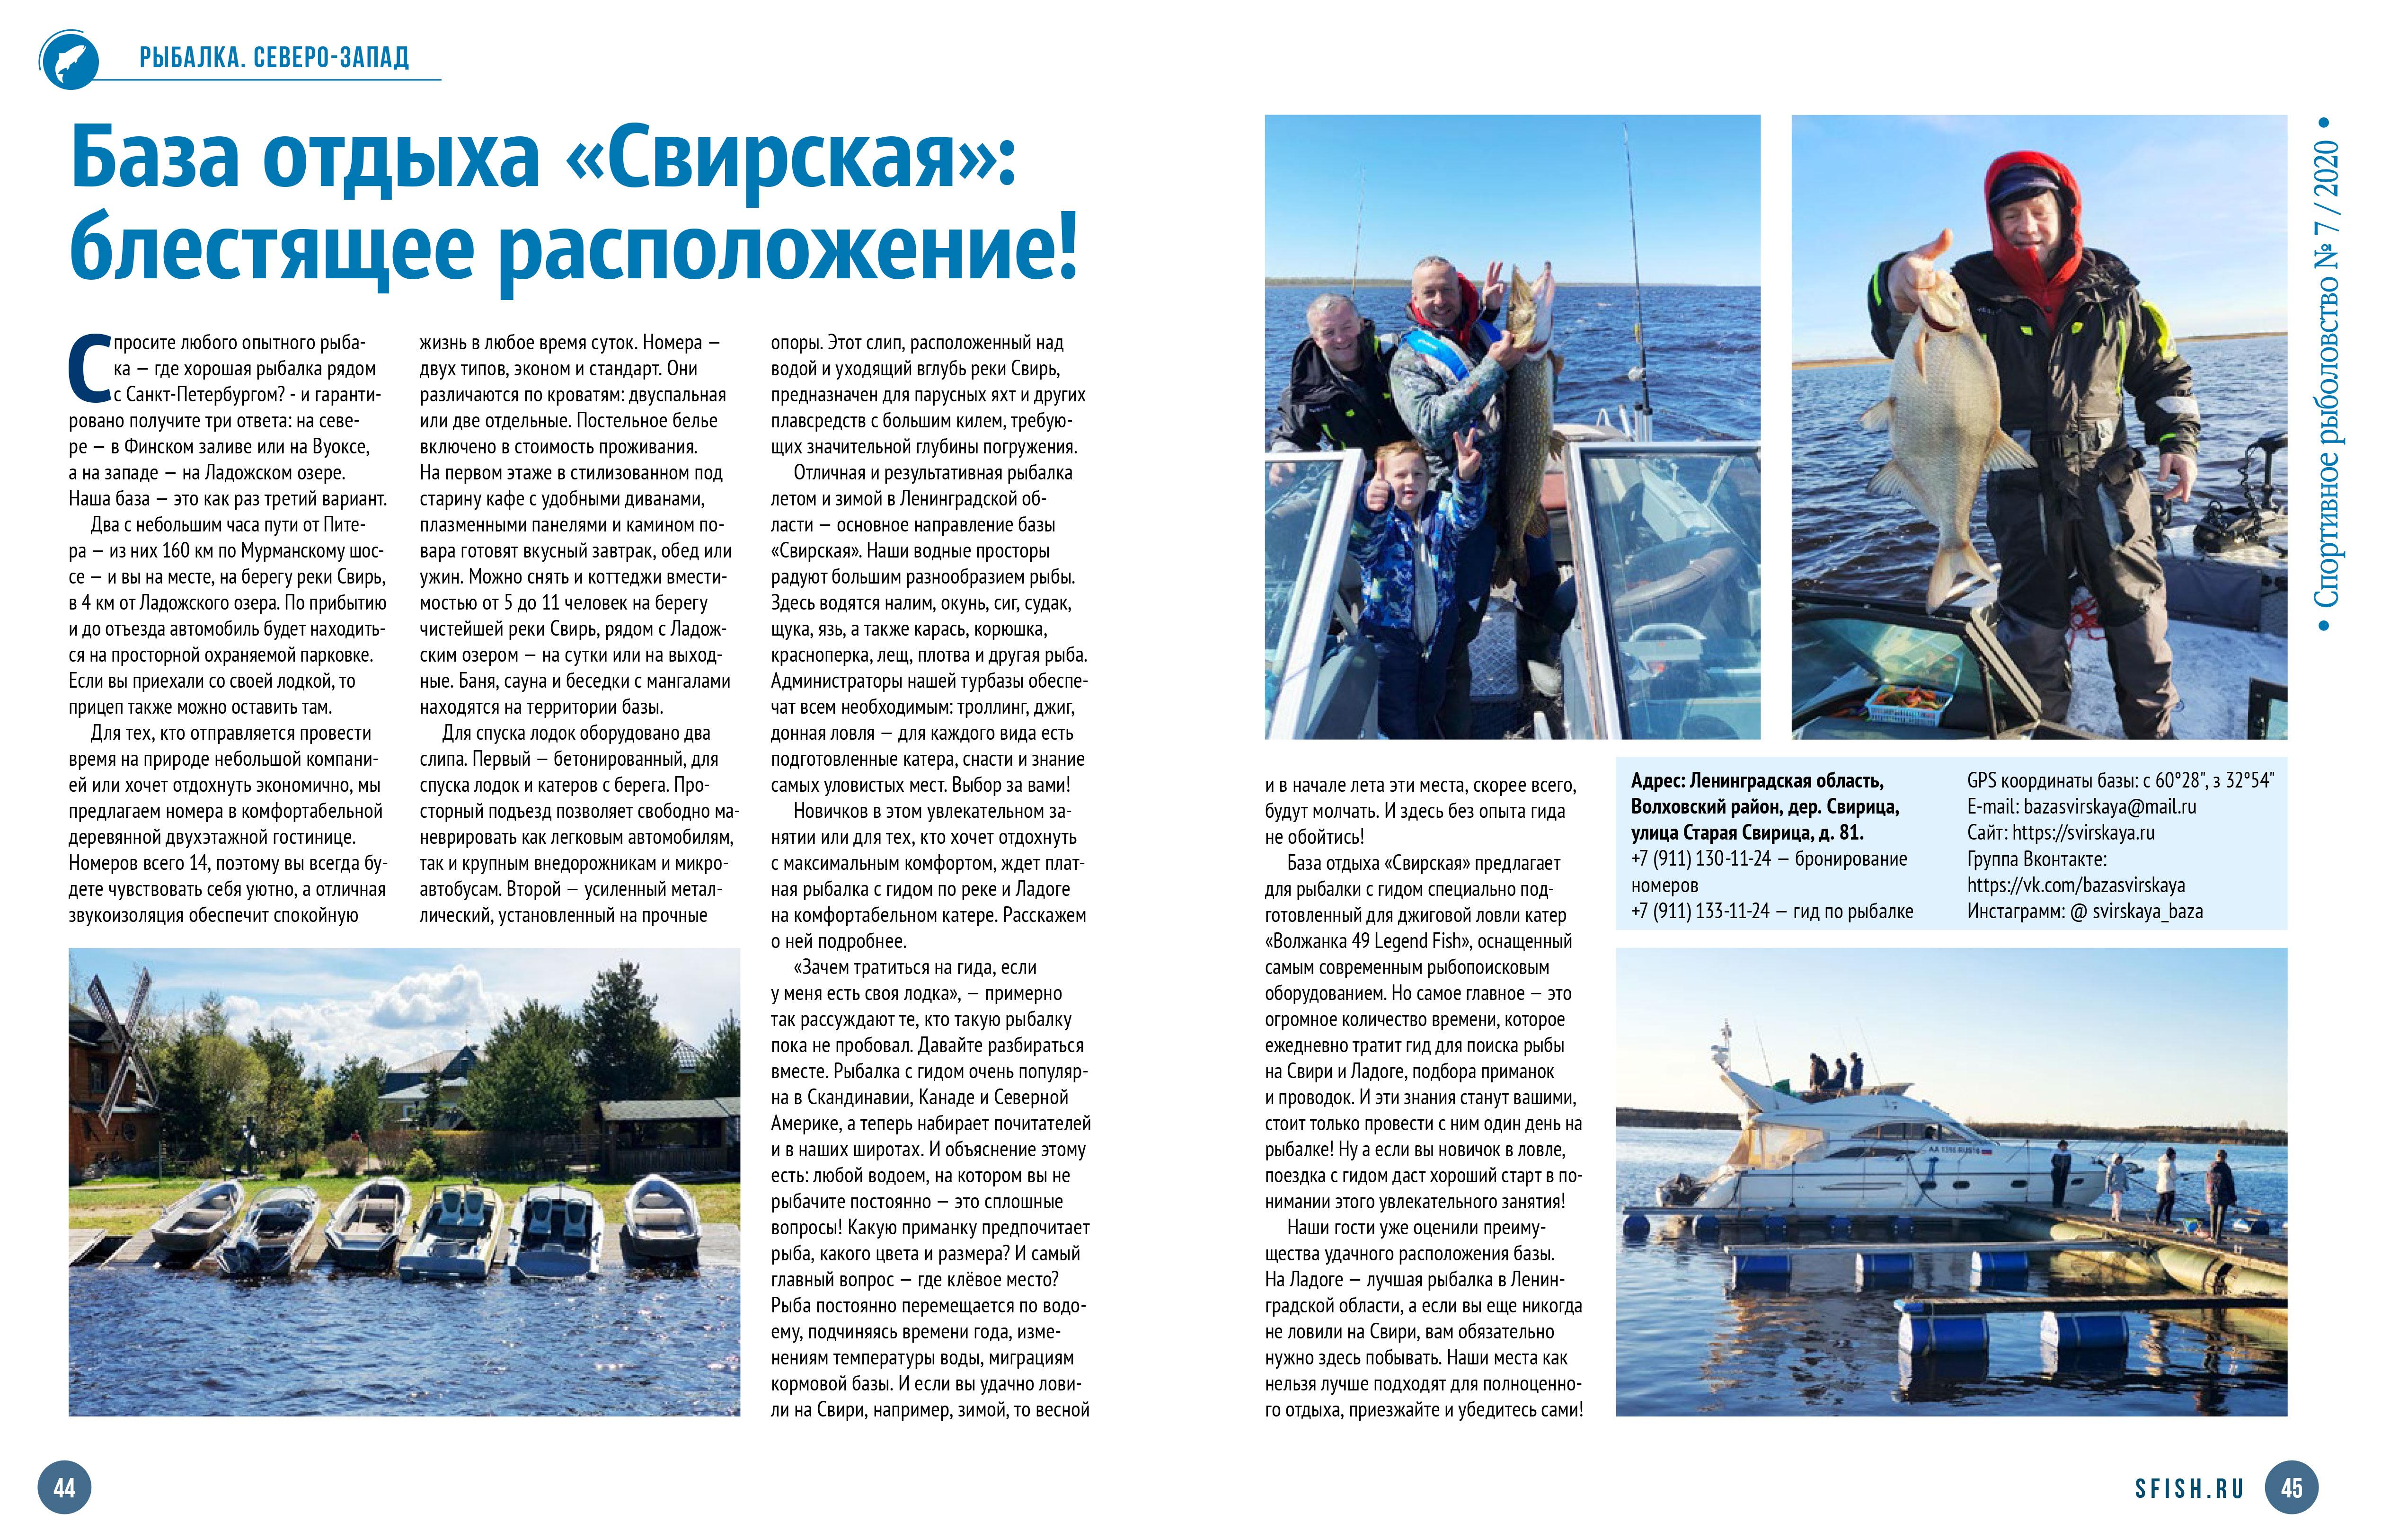 06 Svirskaya 2 рыбалка на базе Свирская